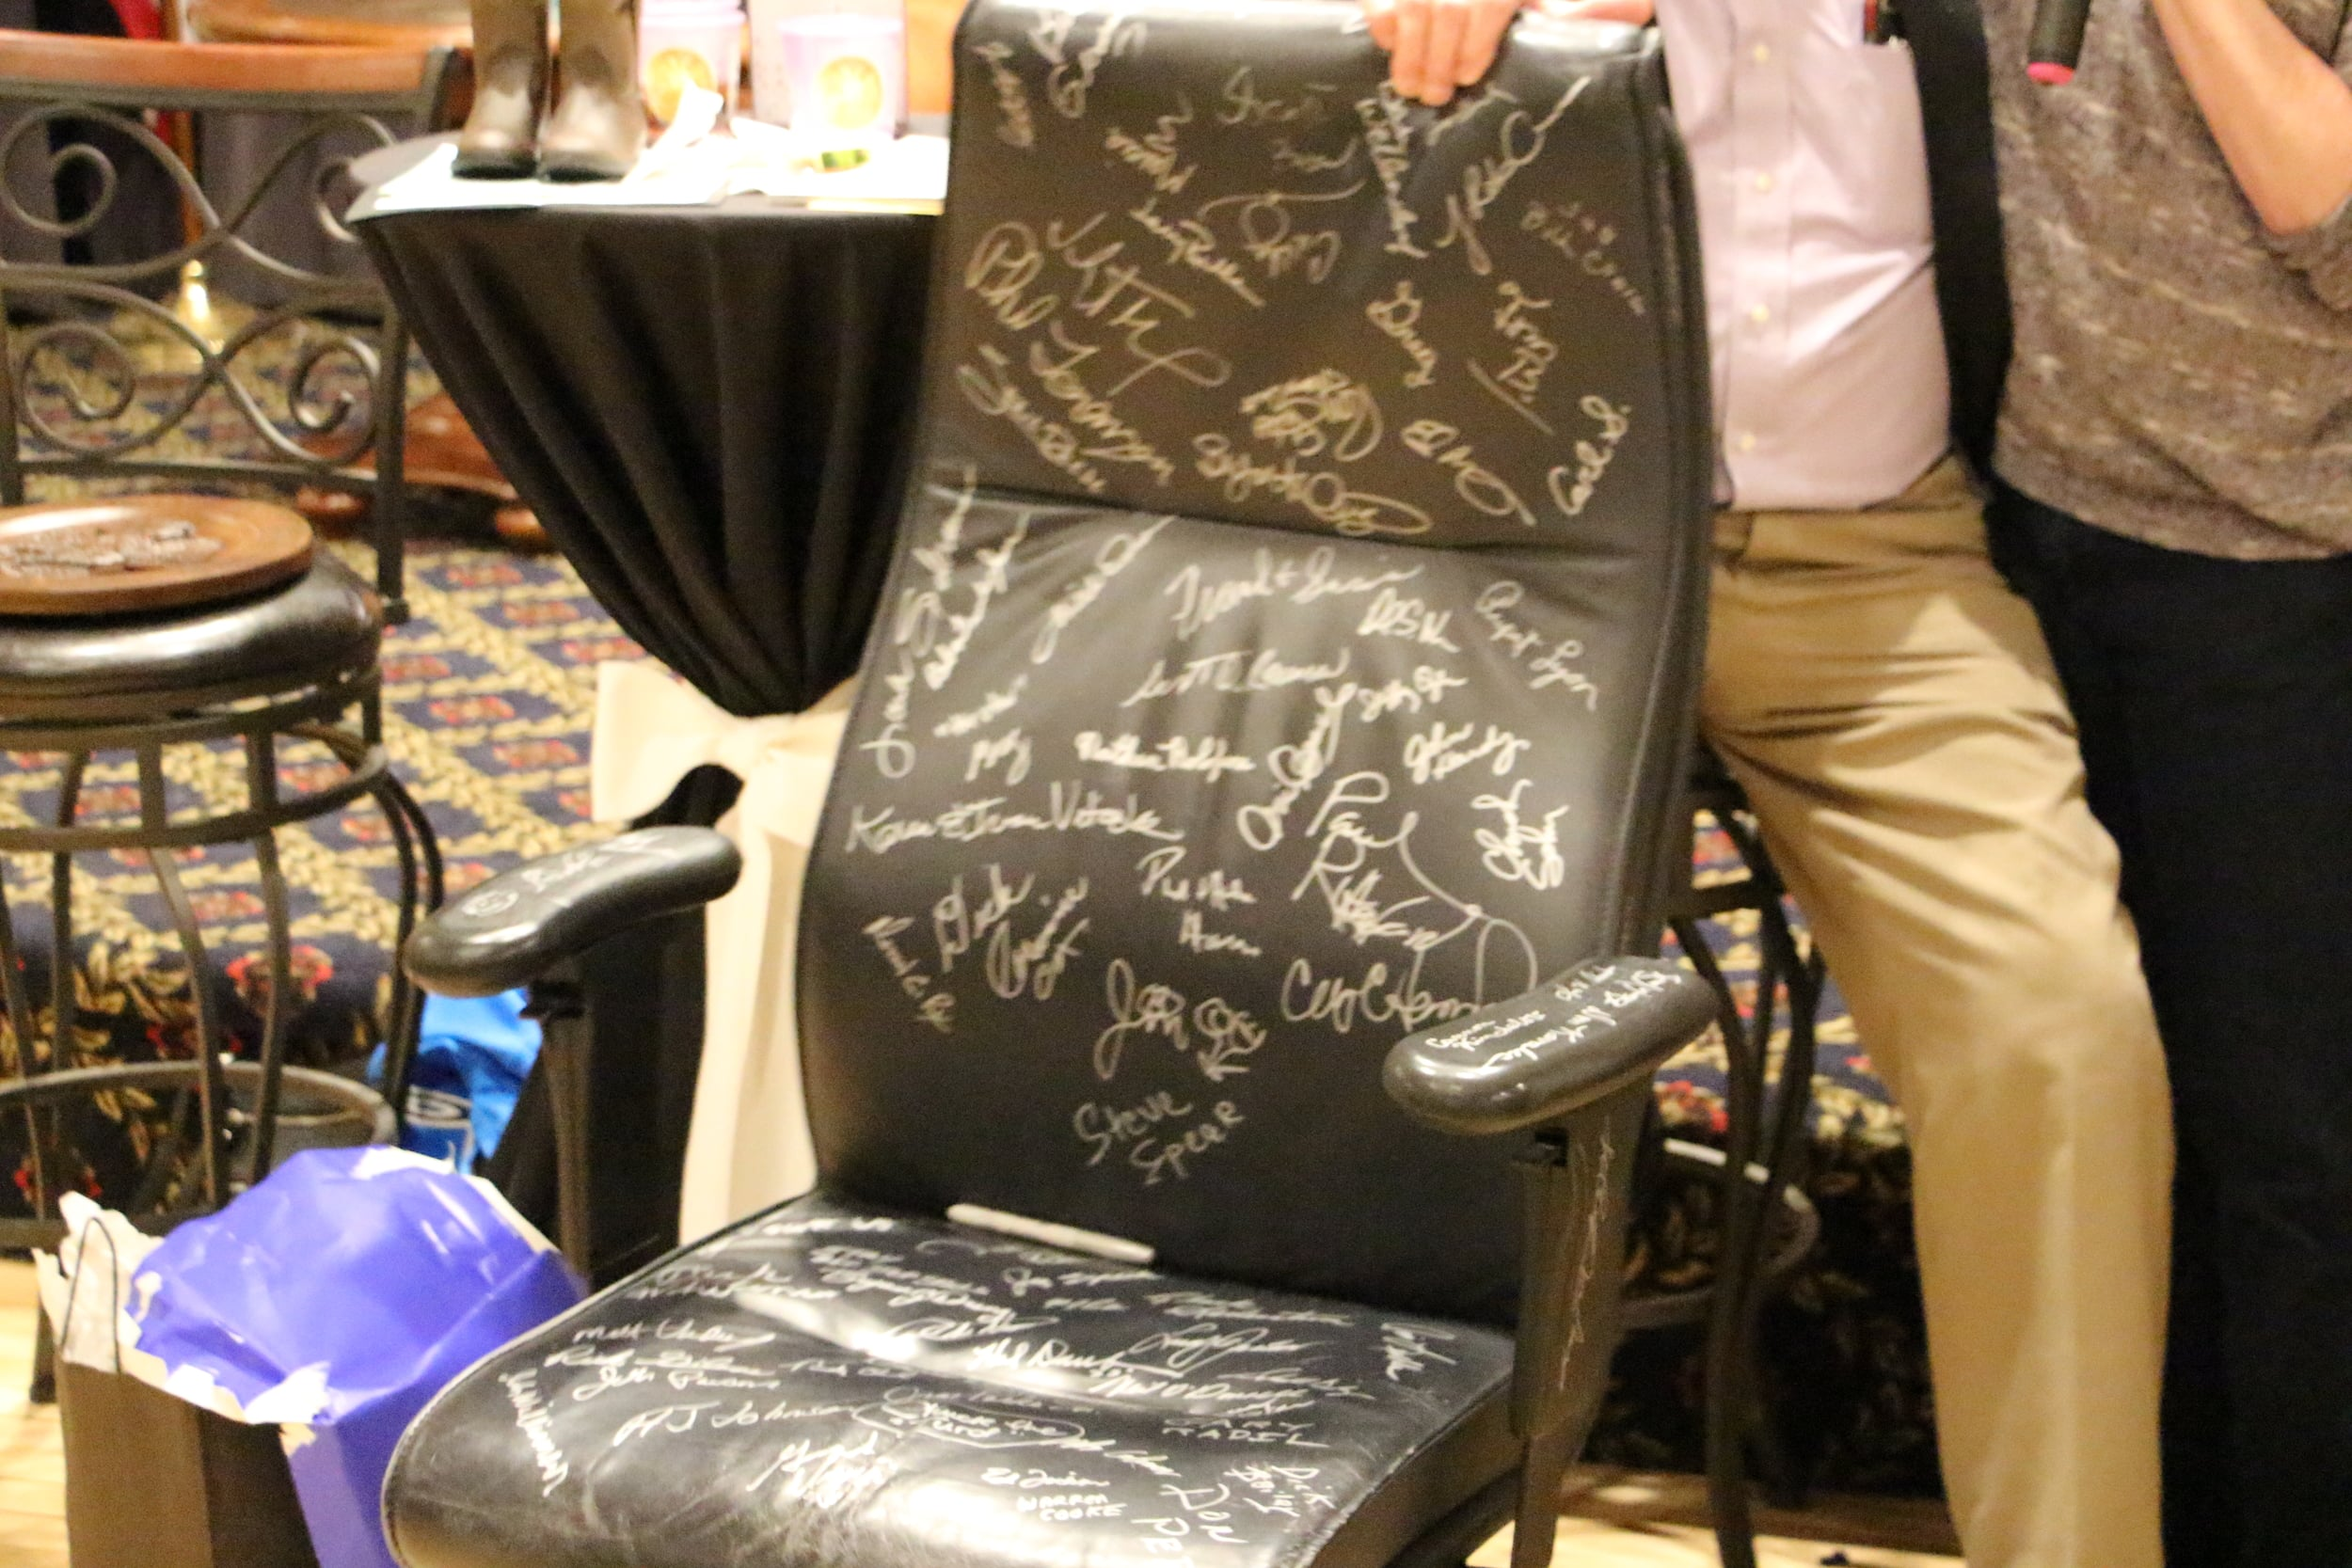 Curt's office chair